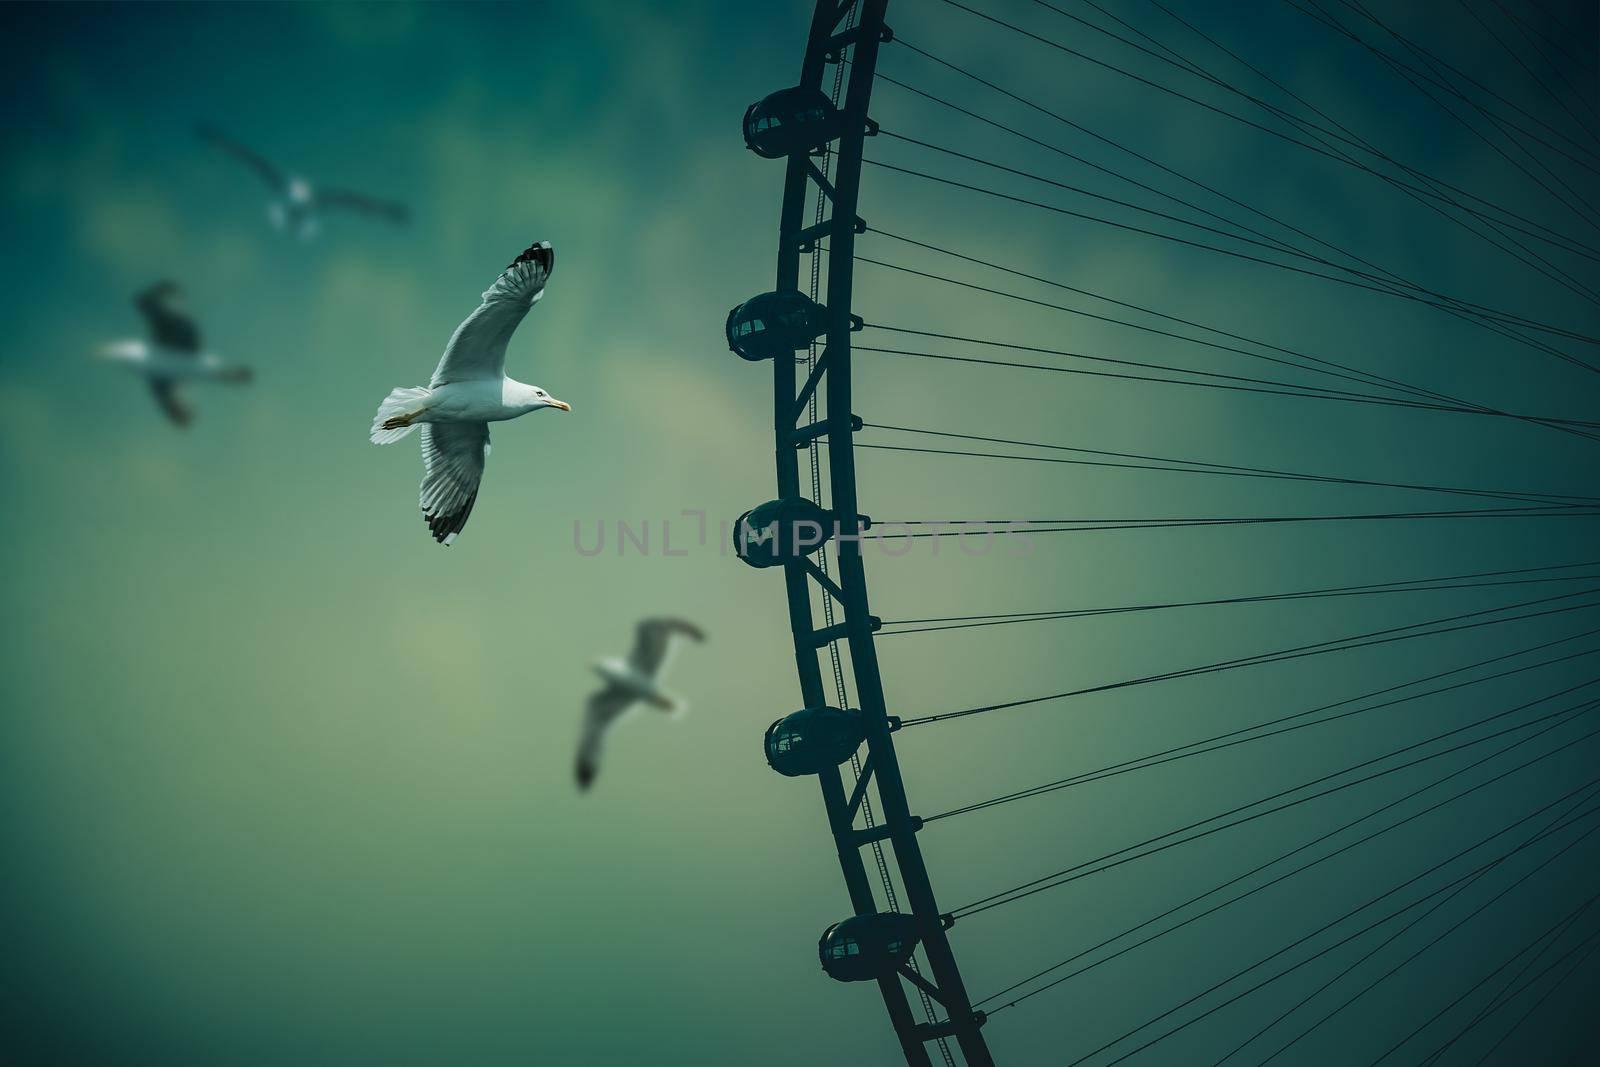 Dubai Eye with Many Beautiful Seagulls. The worlds tallest Ferris Wheel. Bluewater Island, Dubai. UAE.